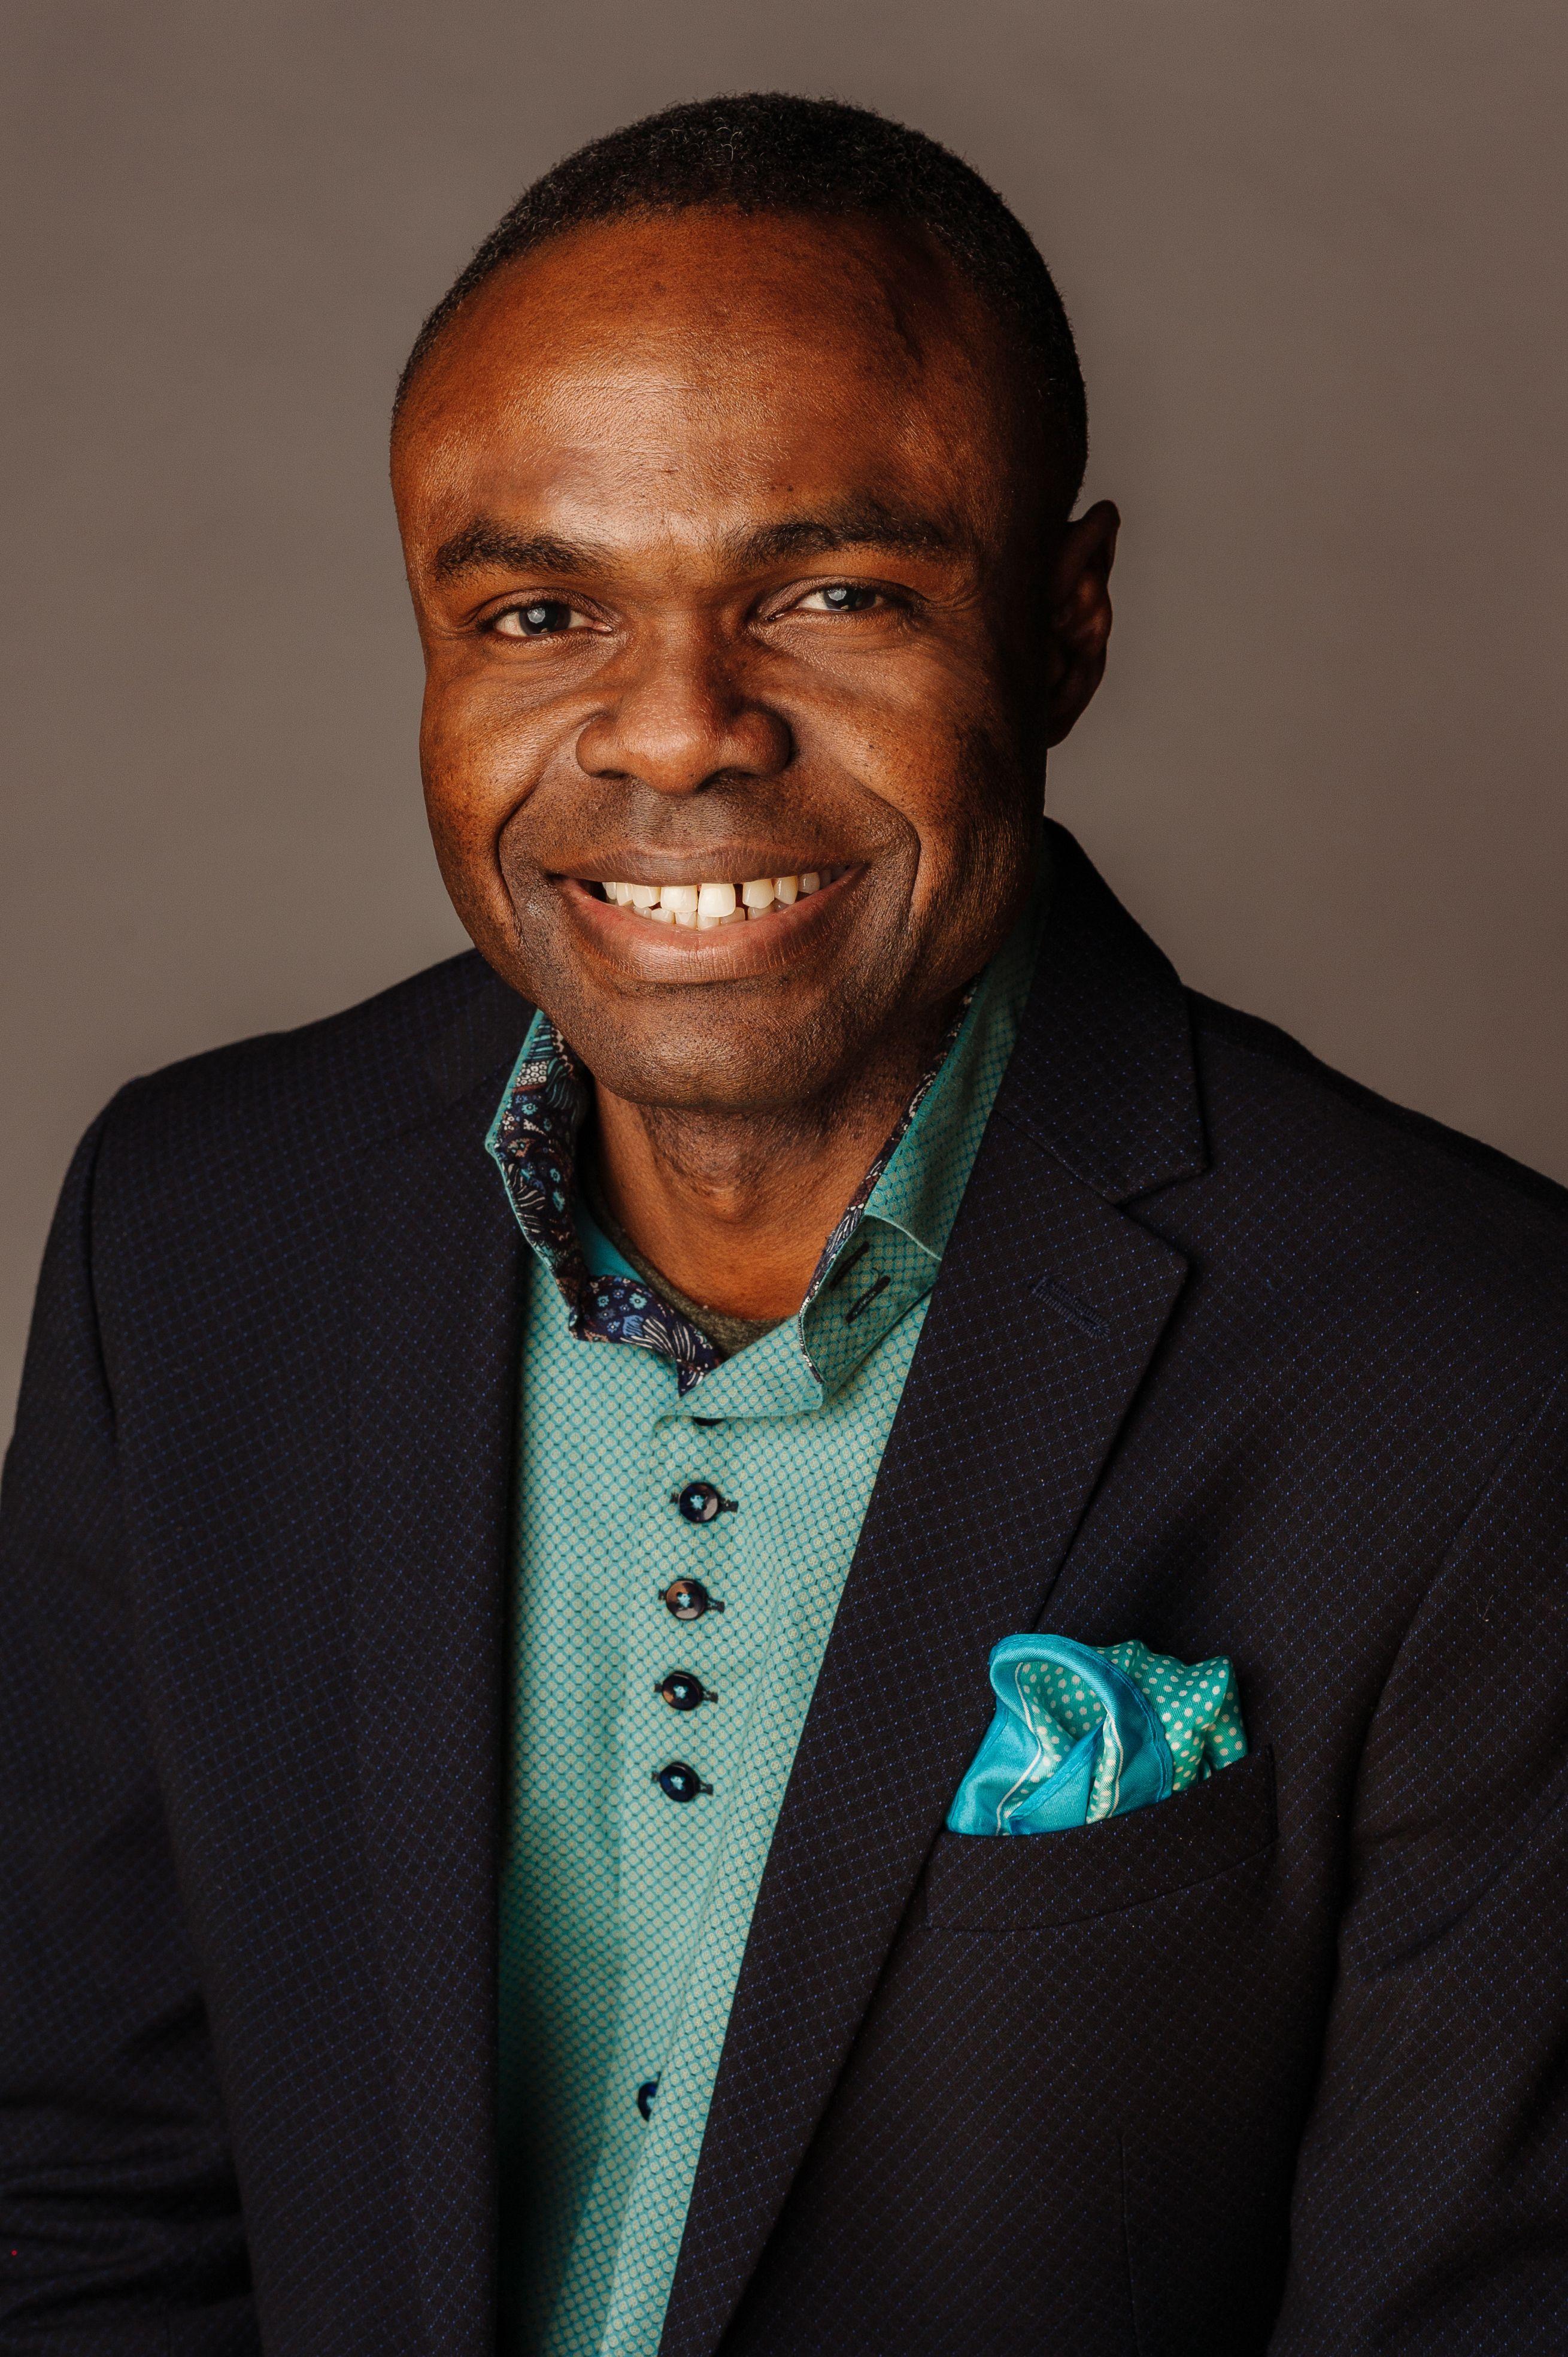 Pastor Dodji Salifou - COO